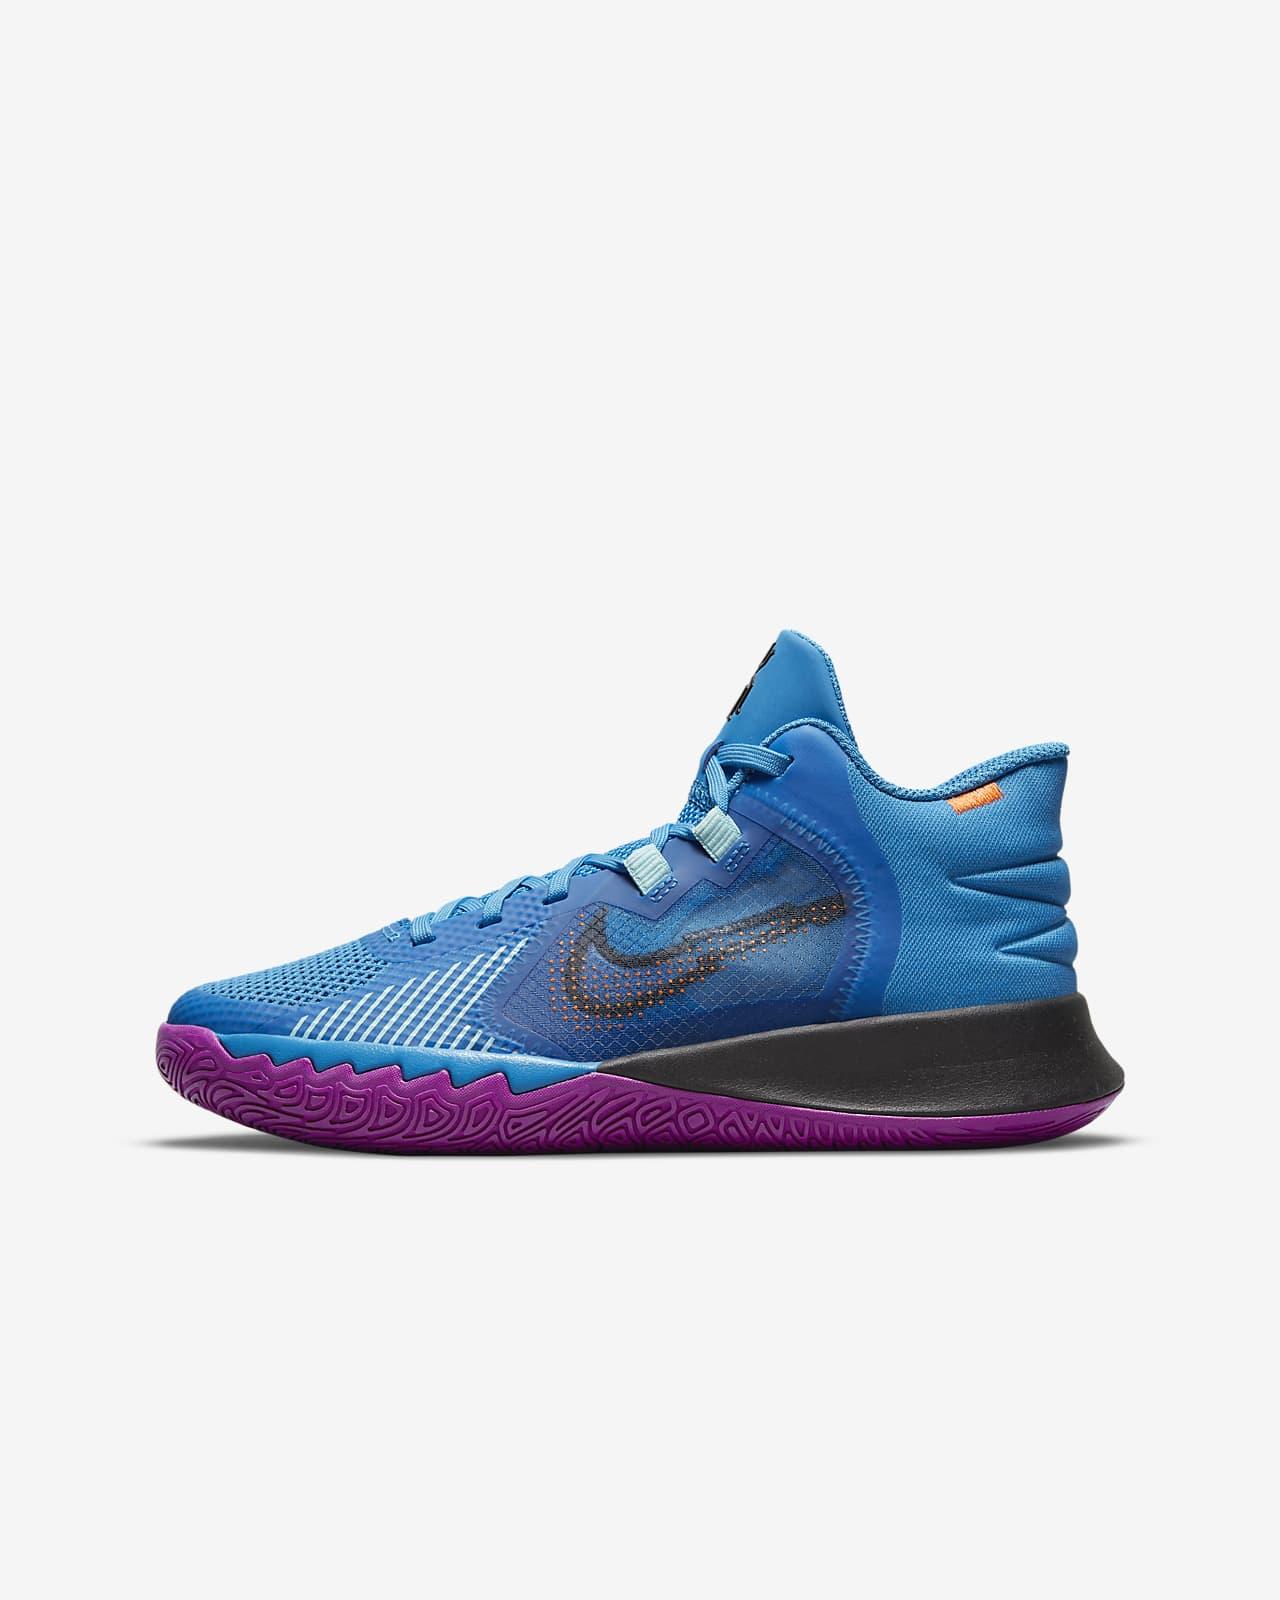 Kyrie Flytrap 5 Big Kids' Basketball Shoes